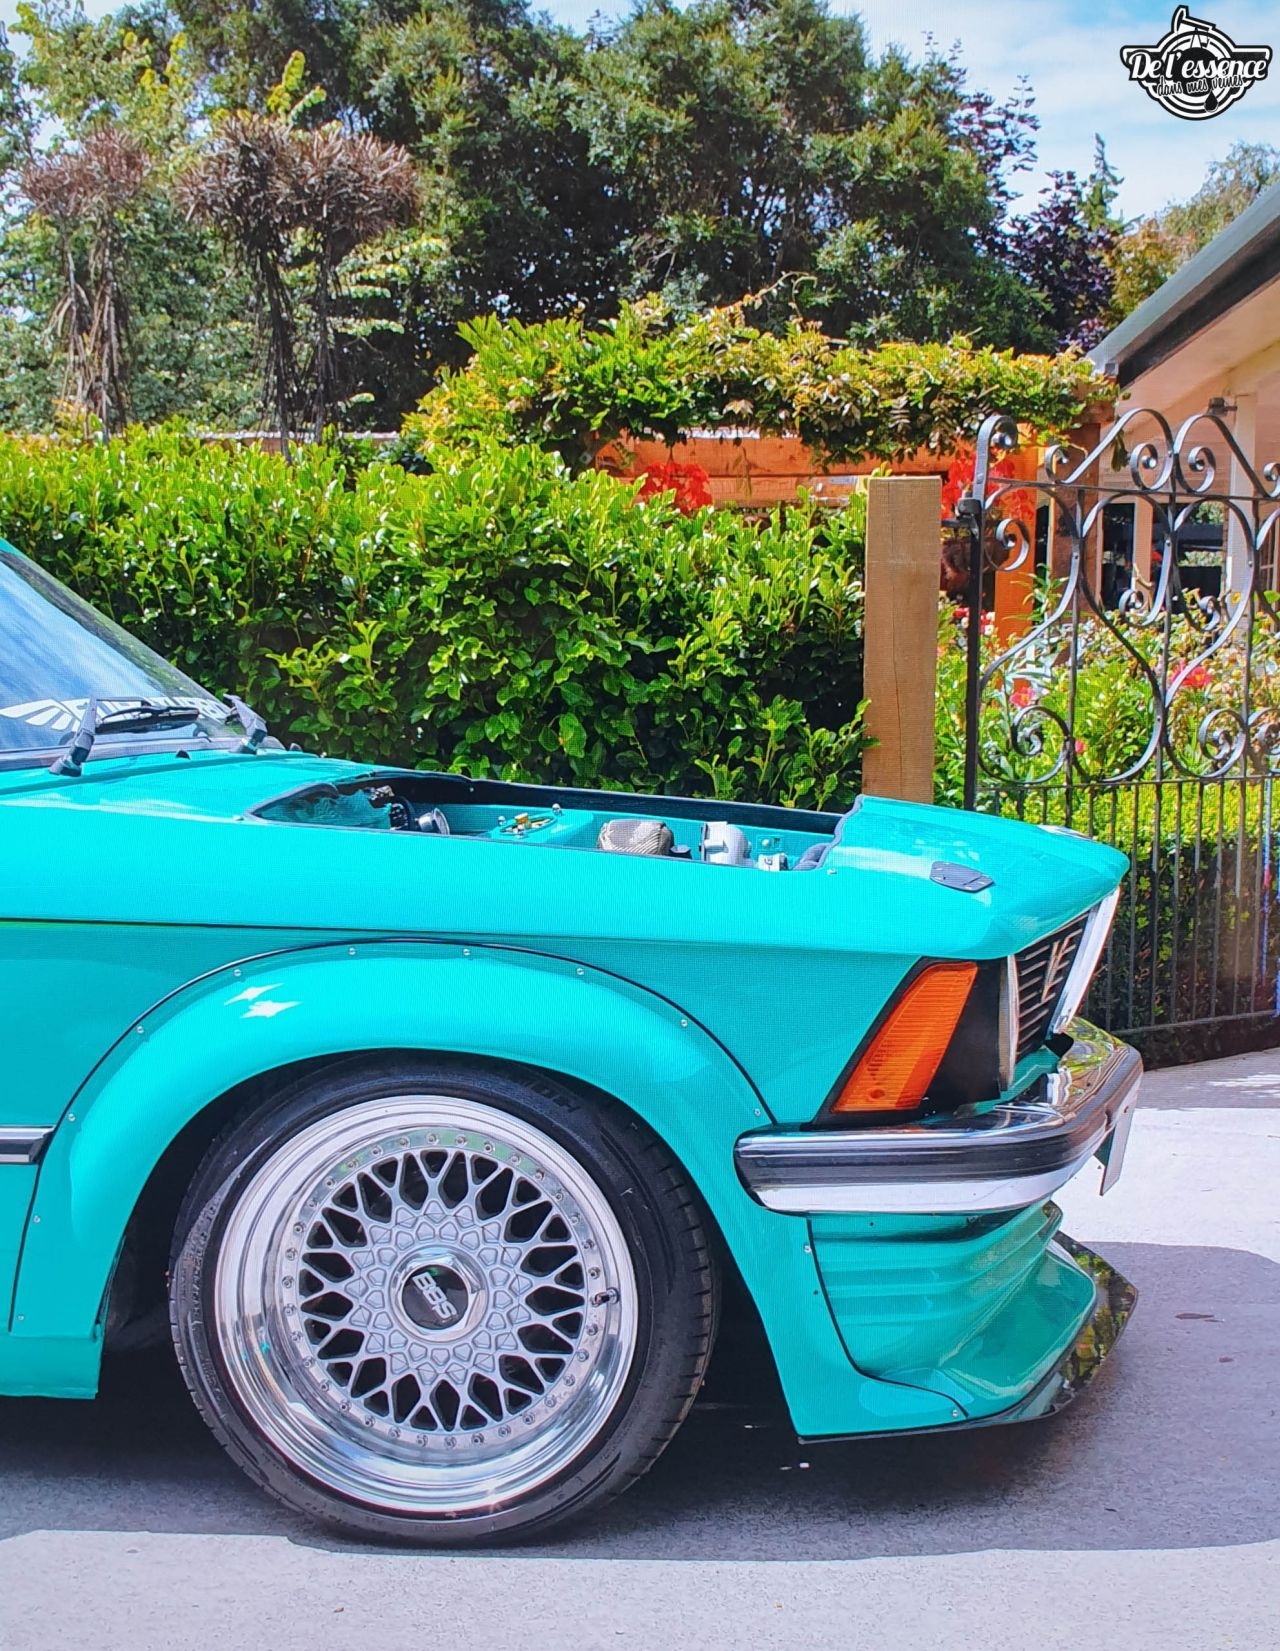 La BMW E21 325i Turbo de Corrie - Requin (très) pressé ! 23